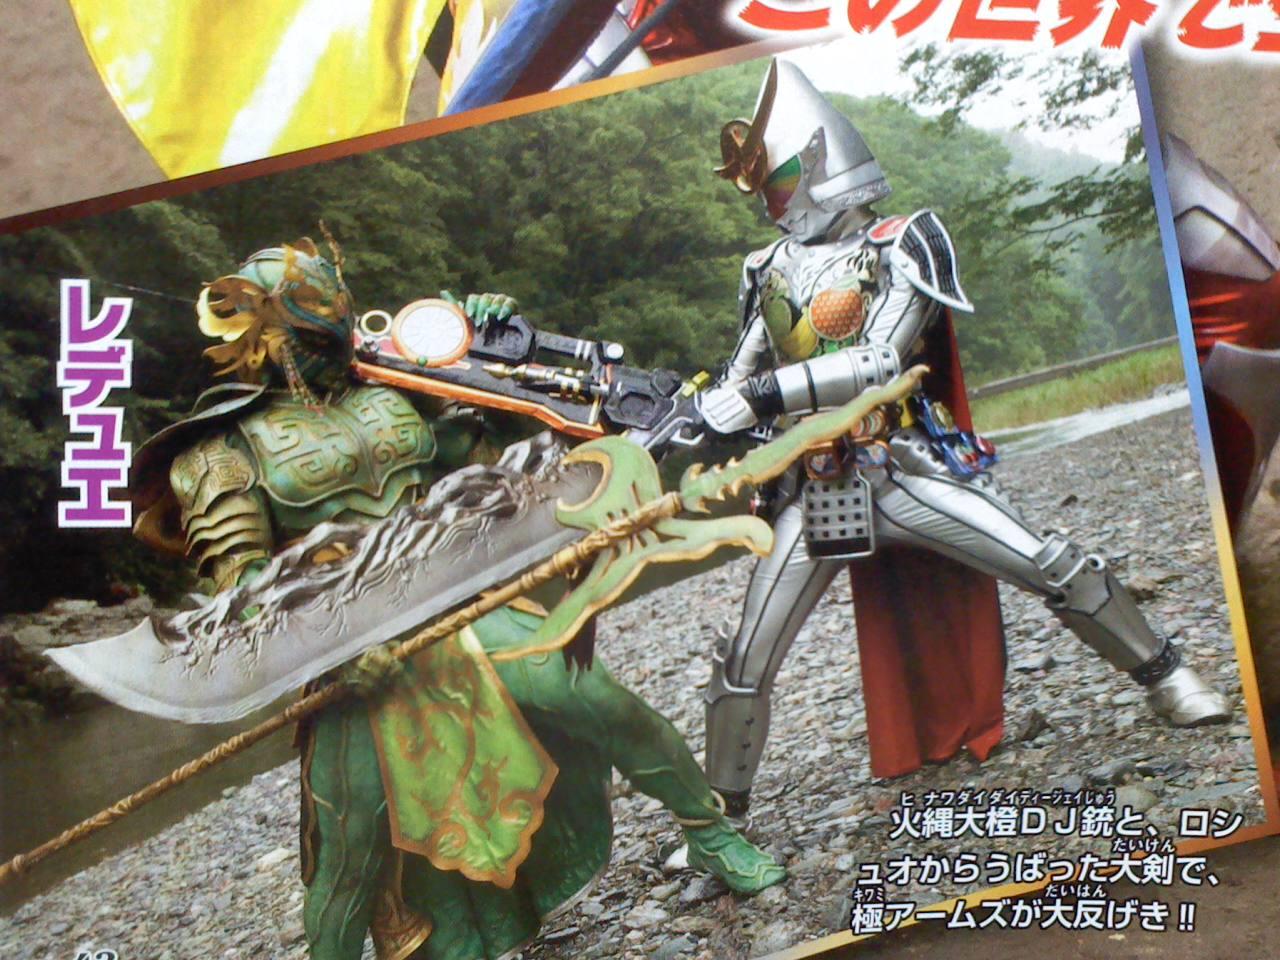 Leaked Magazine Scans Reveal Upcoming Plot Details for Kamen Rider Gaim